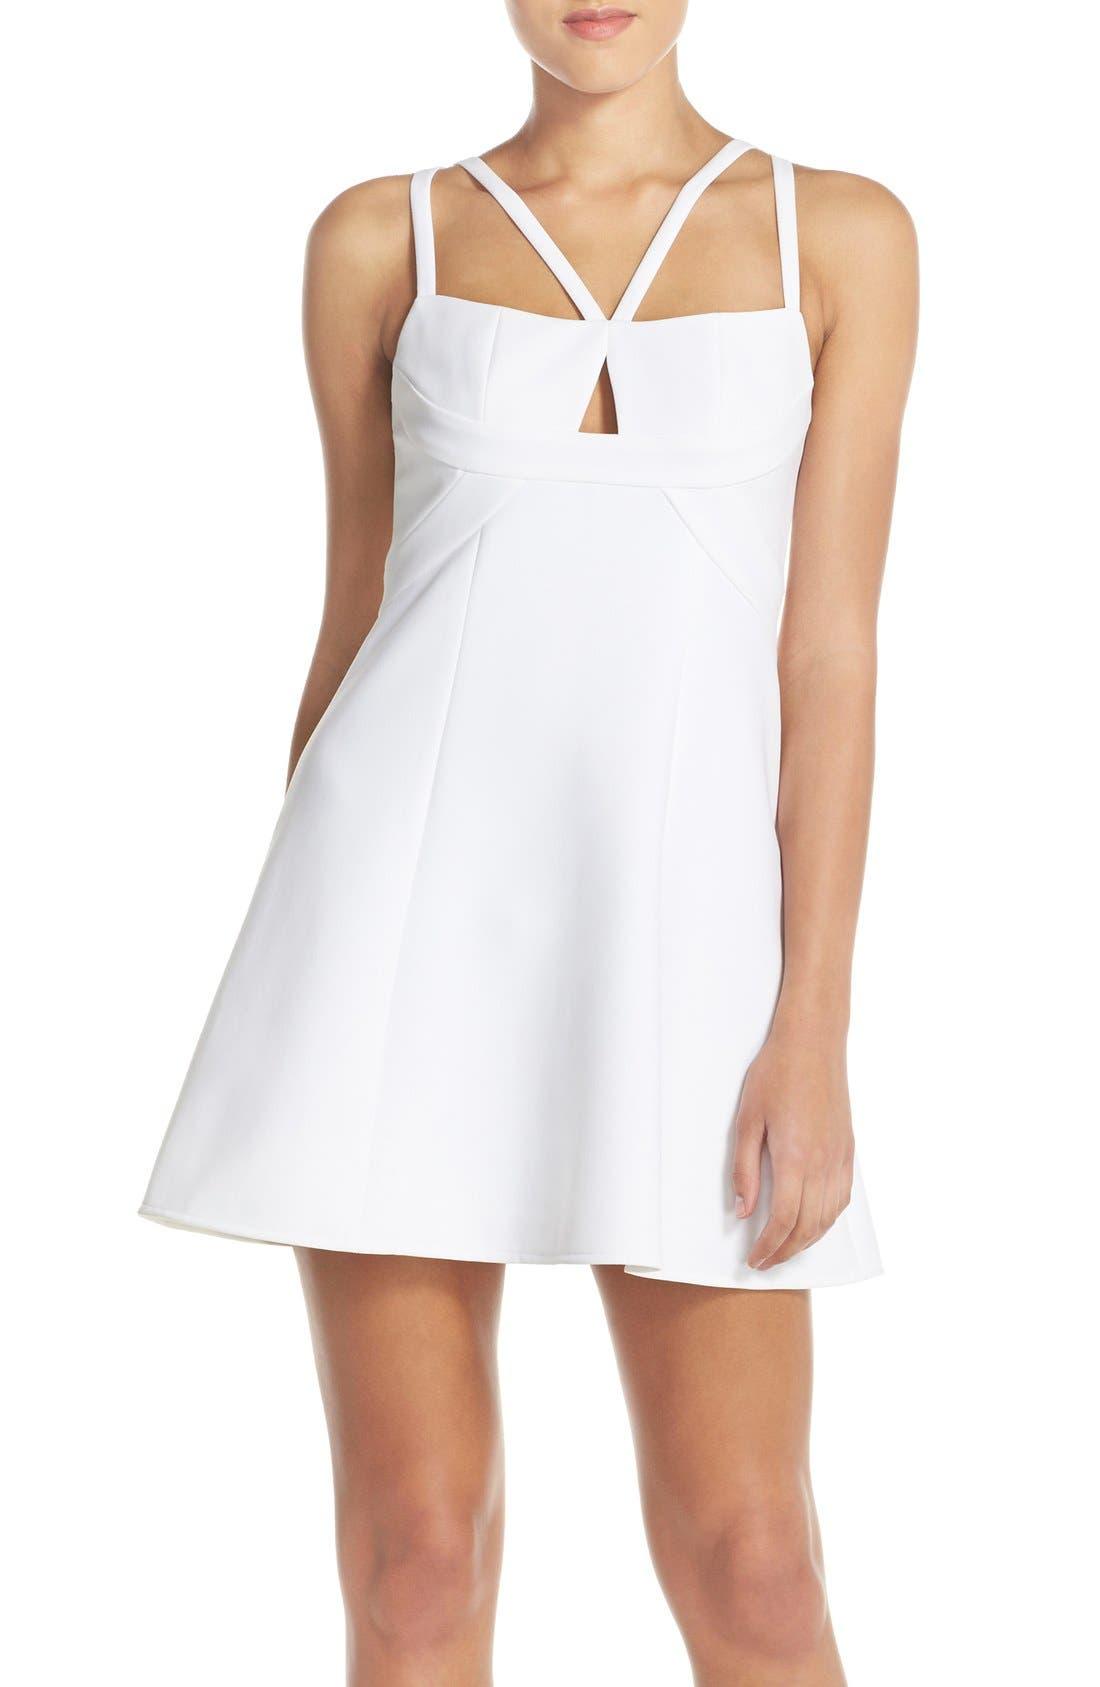 Main Image - BCBGMAXAZRIA 'Charlot' Cutout Crepe Fit & Flare Dress